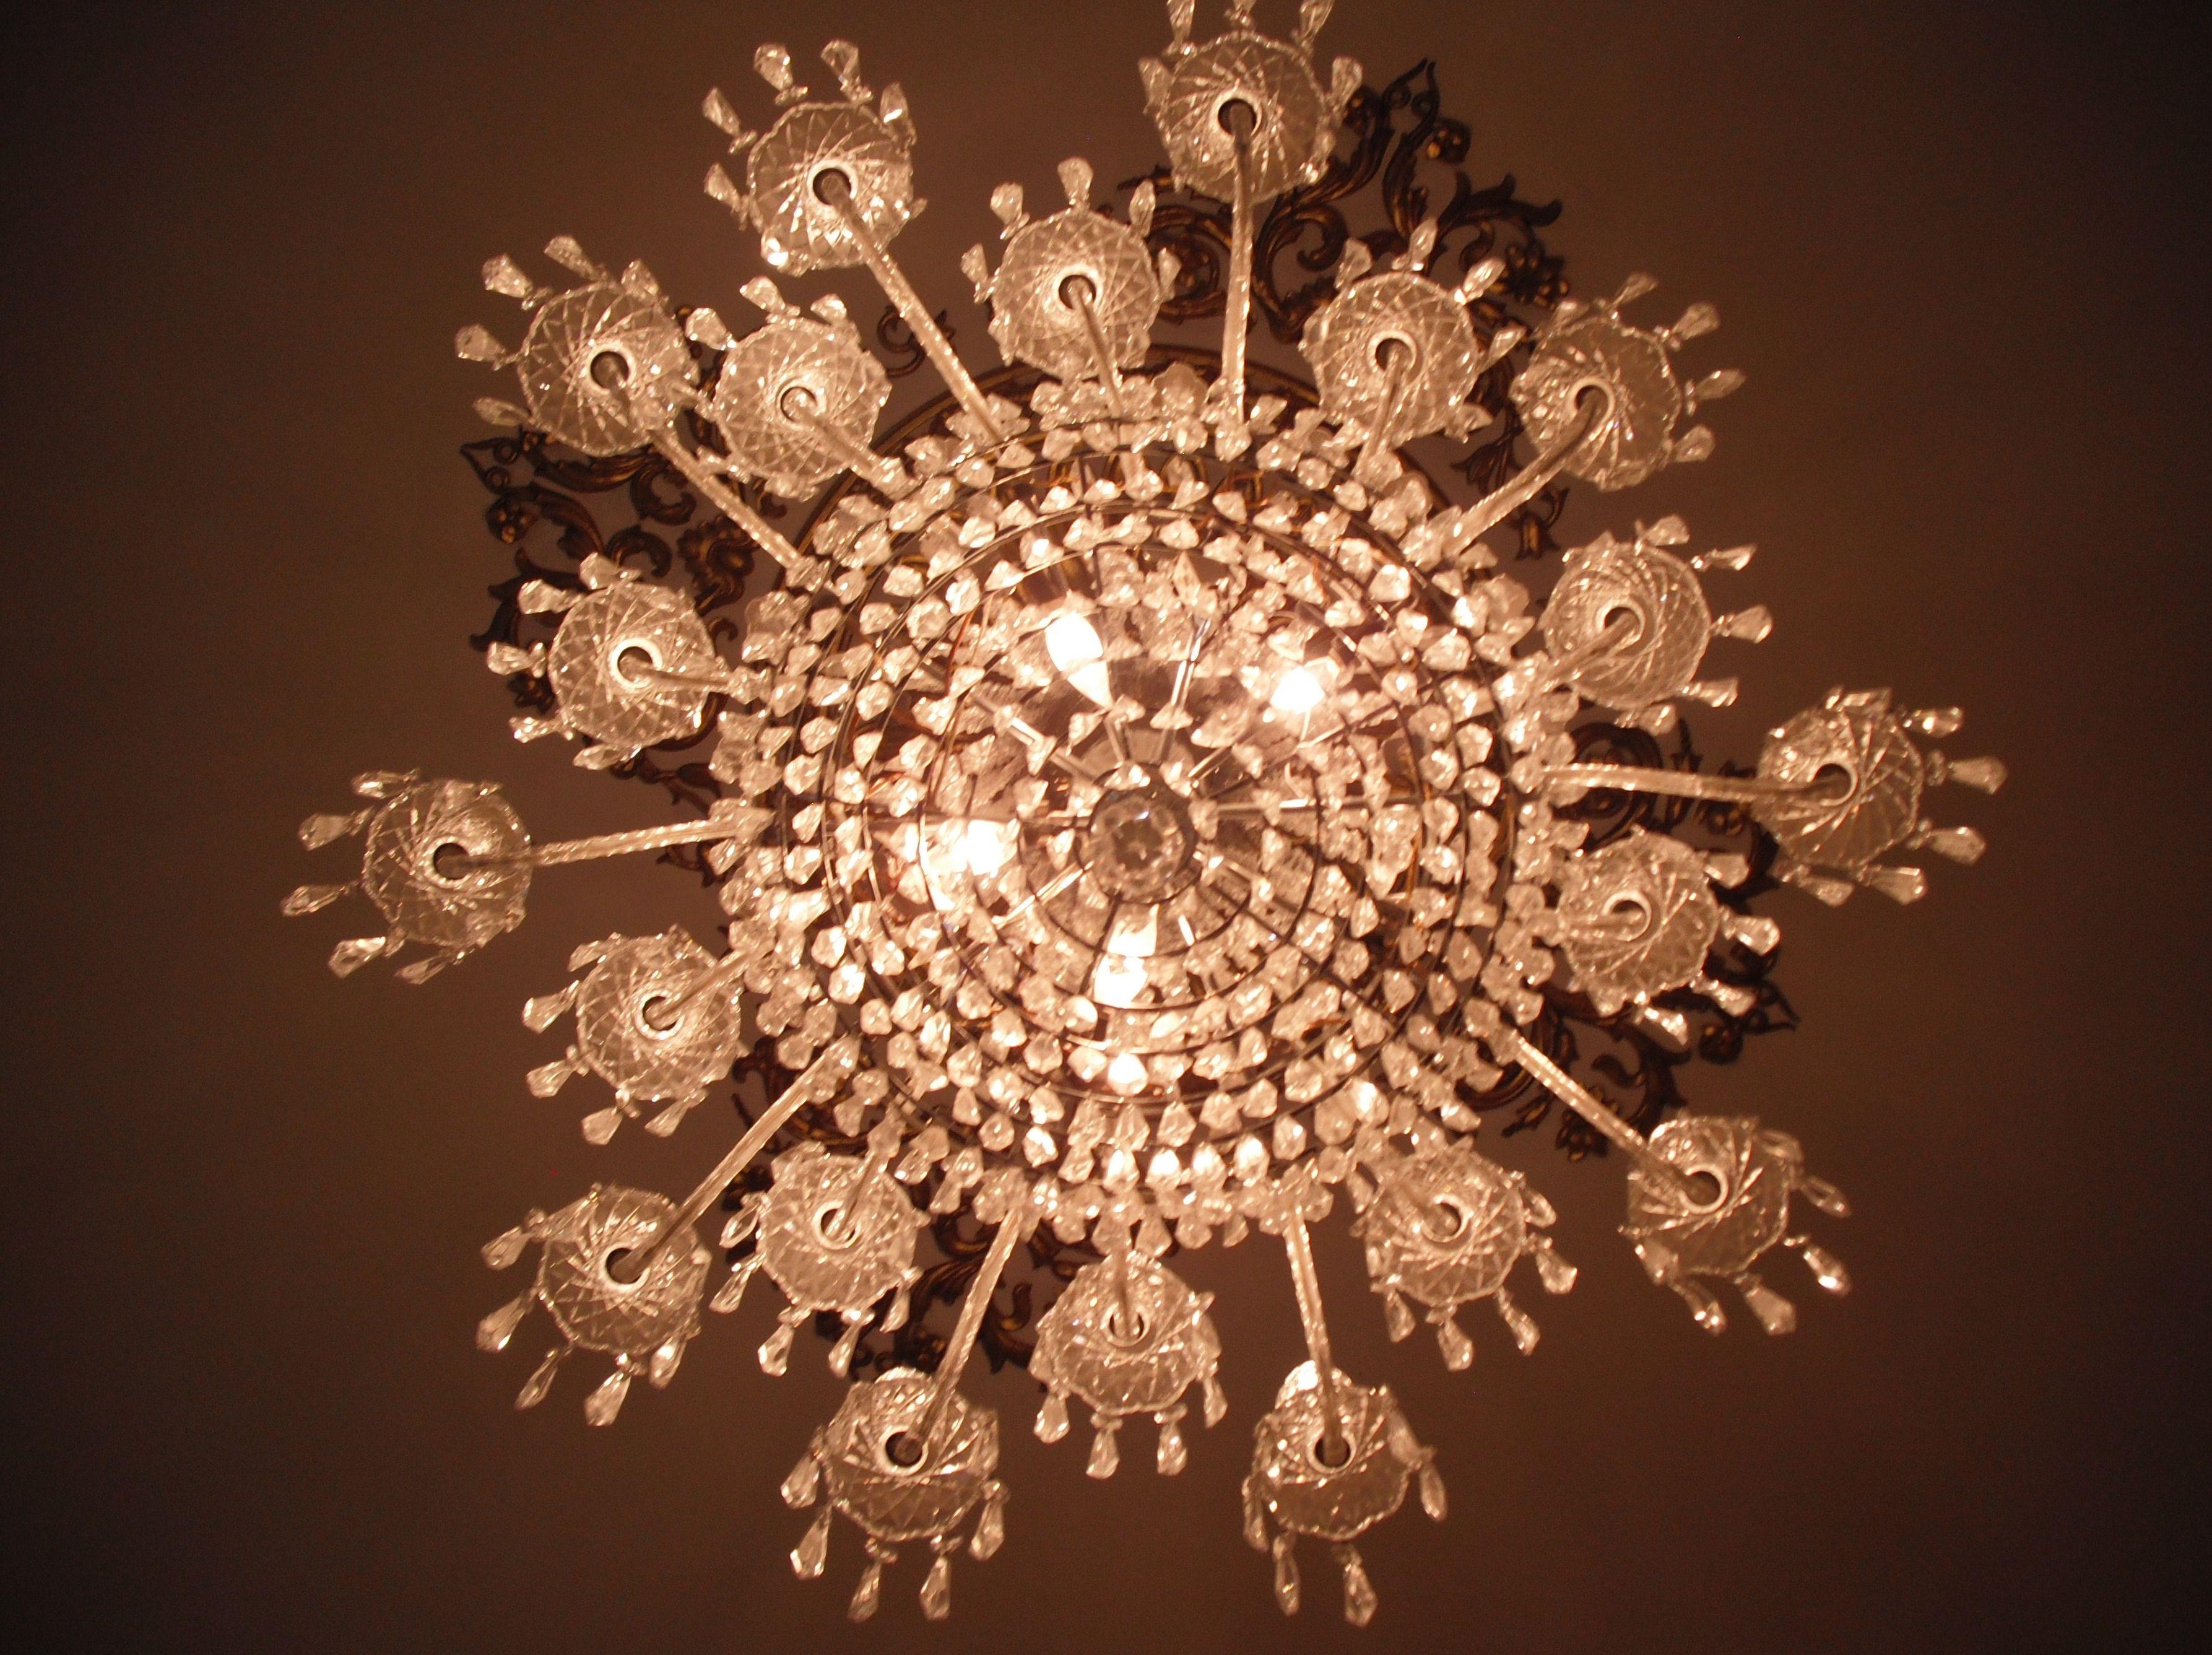 Waterford chandelier dublin castle clocks lighting pinterest waterford chandelier dublin castle arubaitofo Choice Image